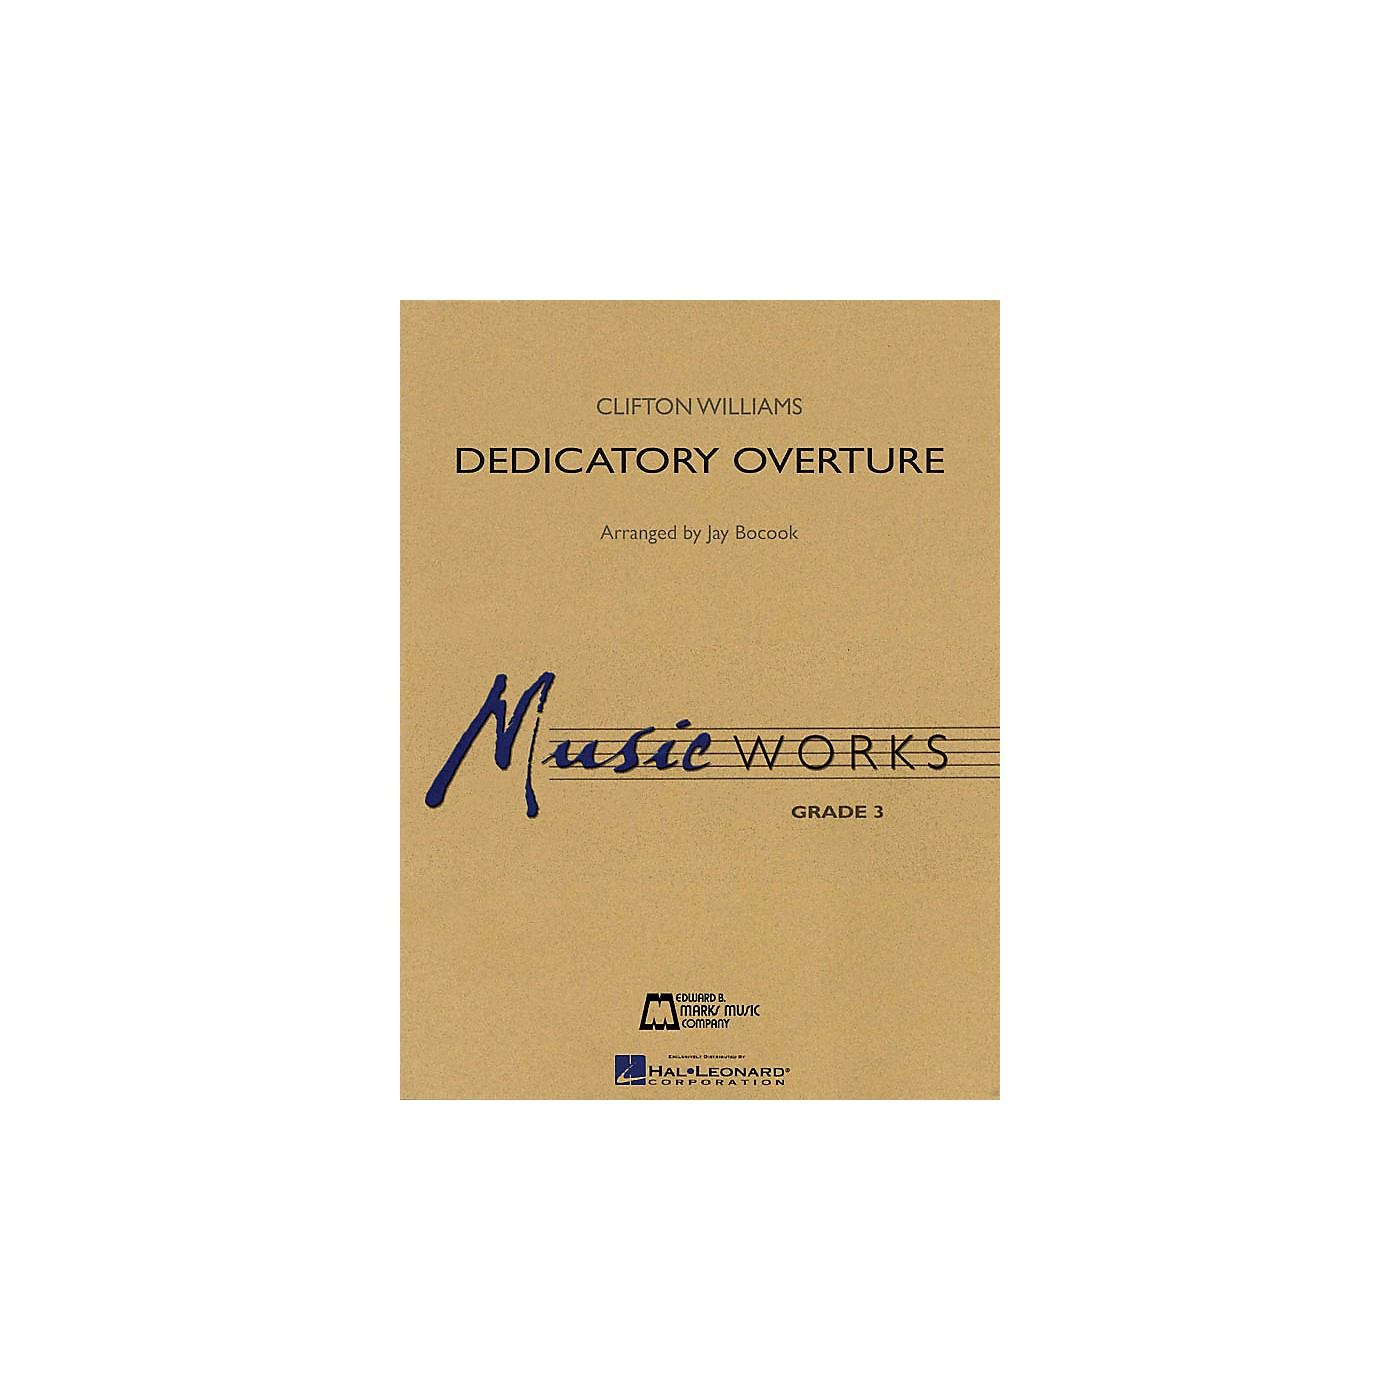 Hal Leonard Dedicatory Overture Concert Band Level 3 Arranged by Jay Bocook thumbnail